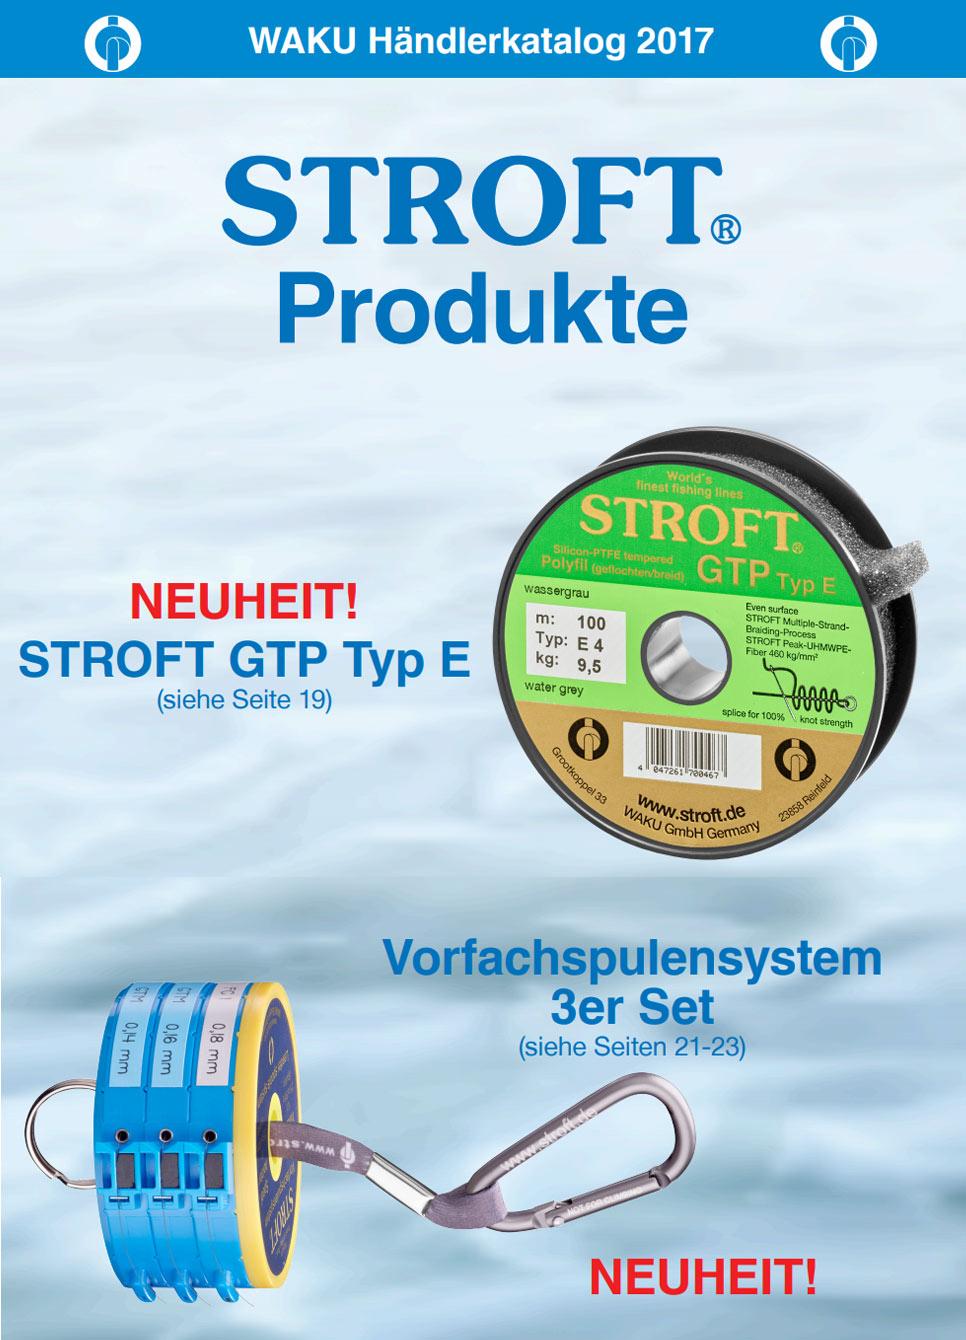 STROFT Katalog 2017